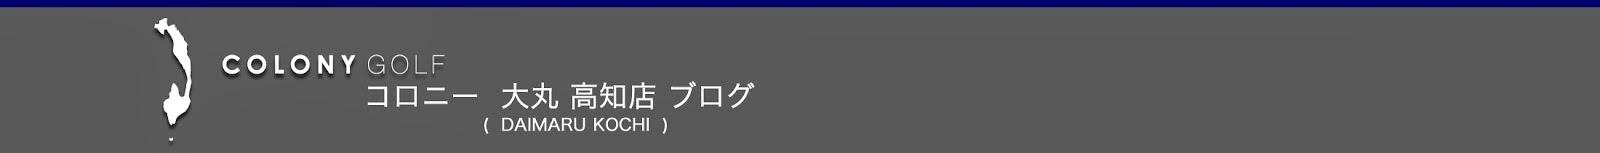 COLONY 高知店 ショップブログ